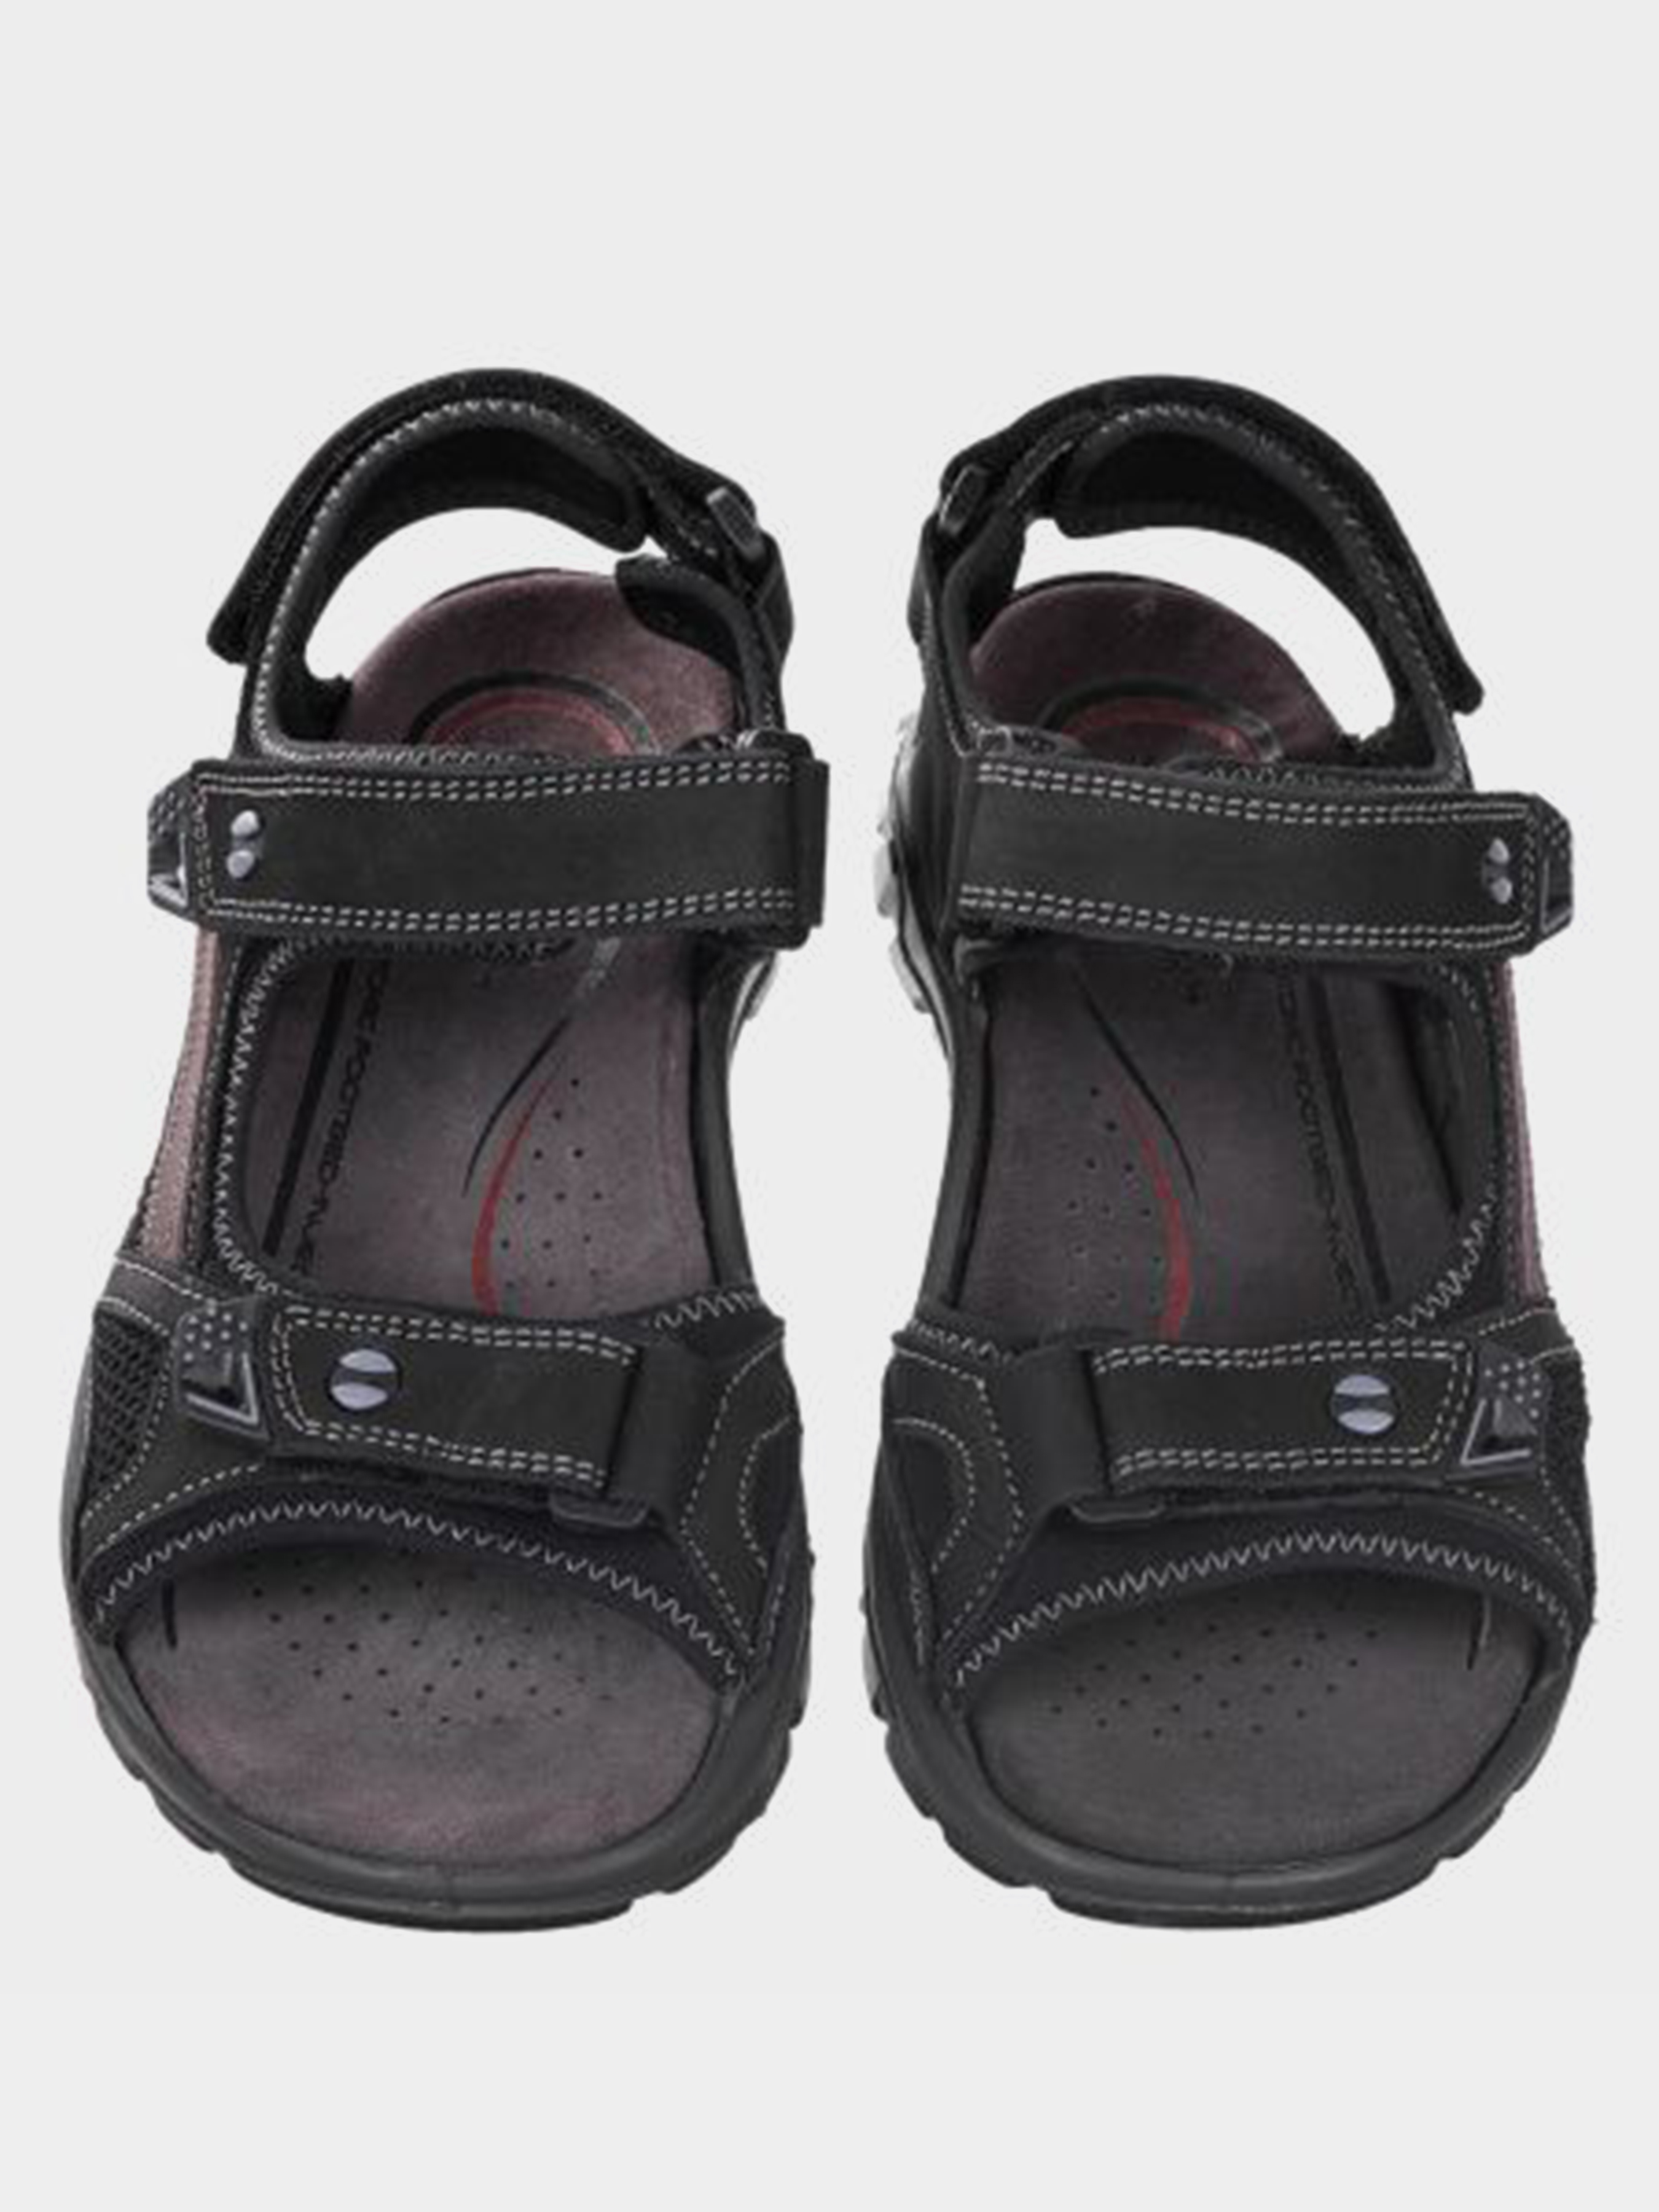 Сандалии для мужчин Salamander сандалії чол.(39-46) 3O42 размерная сетка обуви, 2017